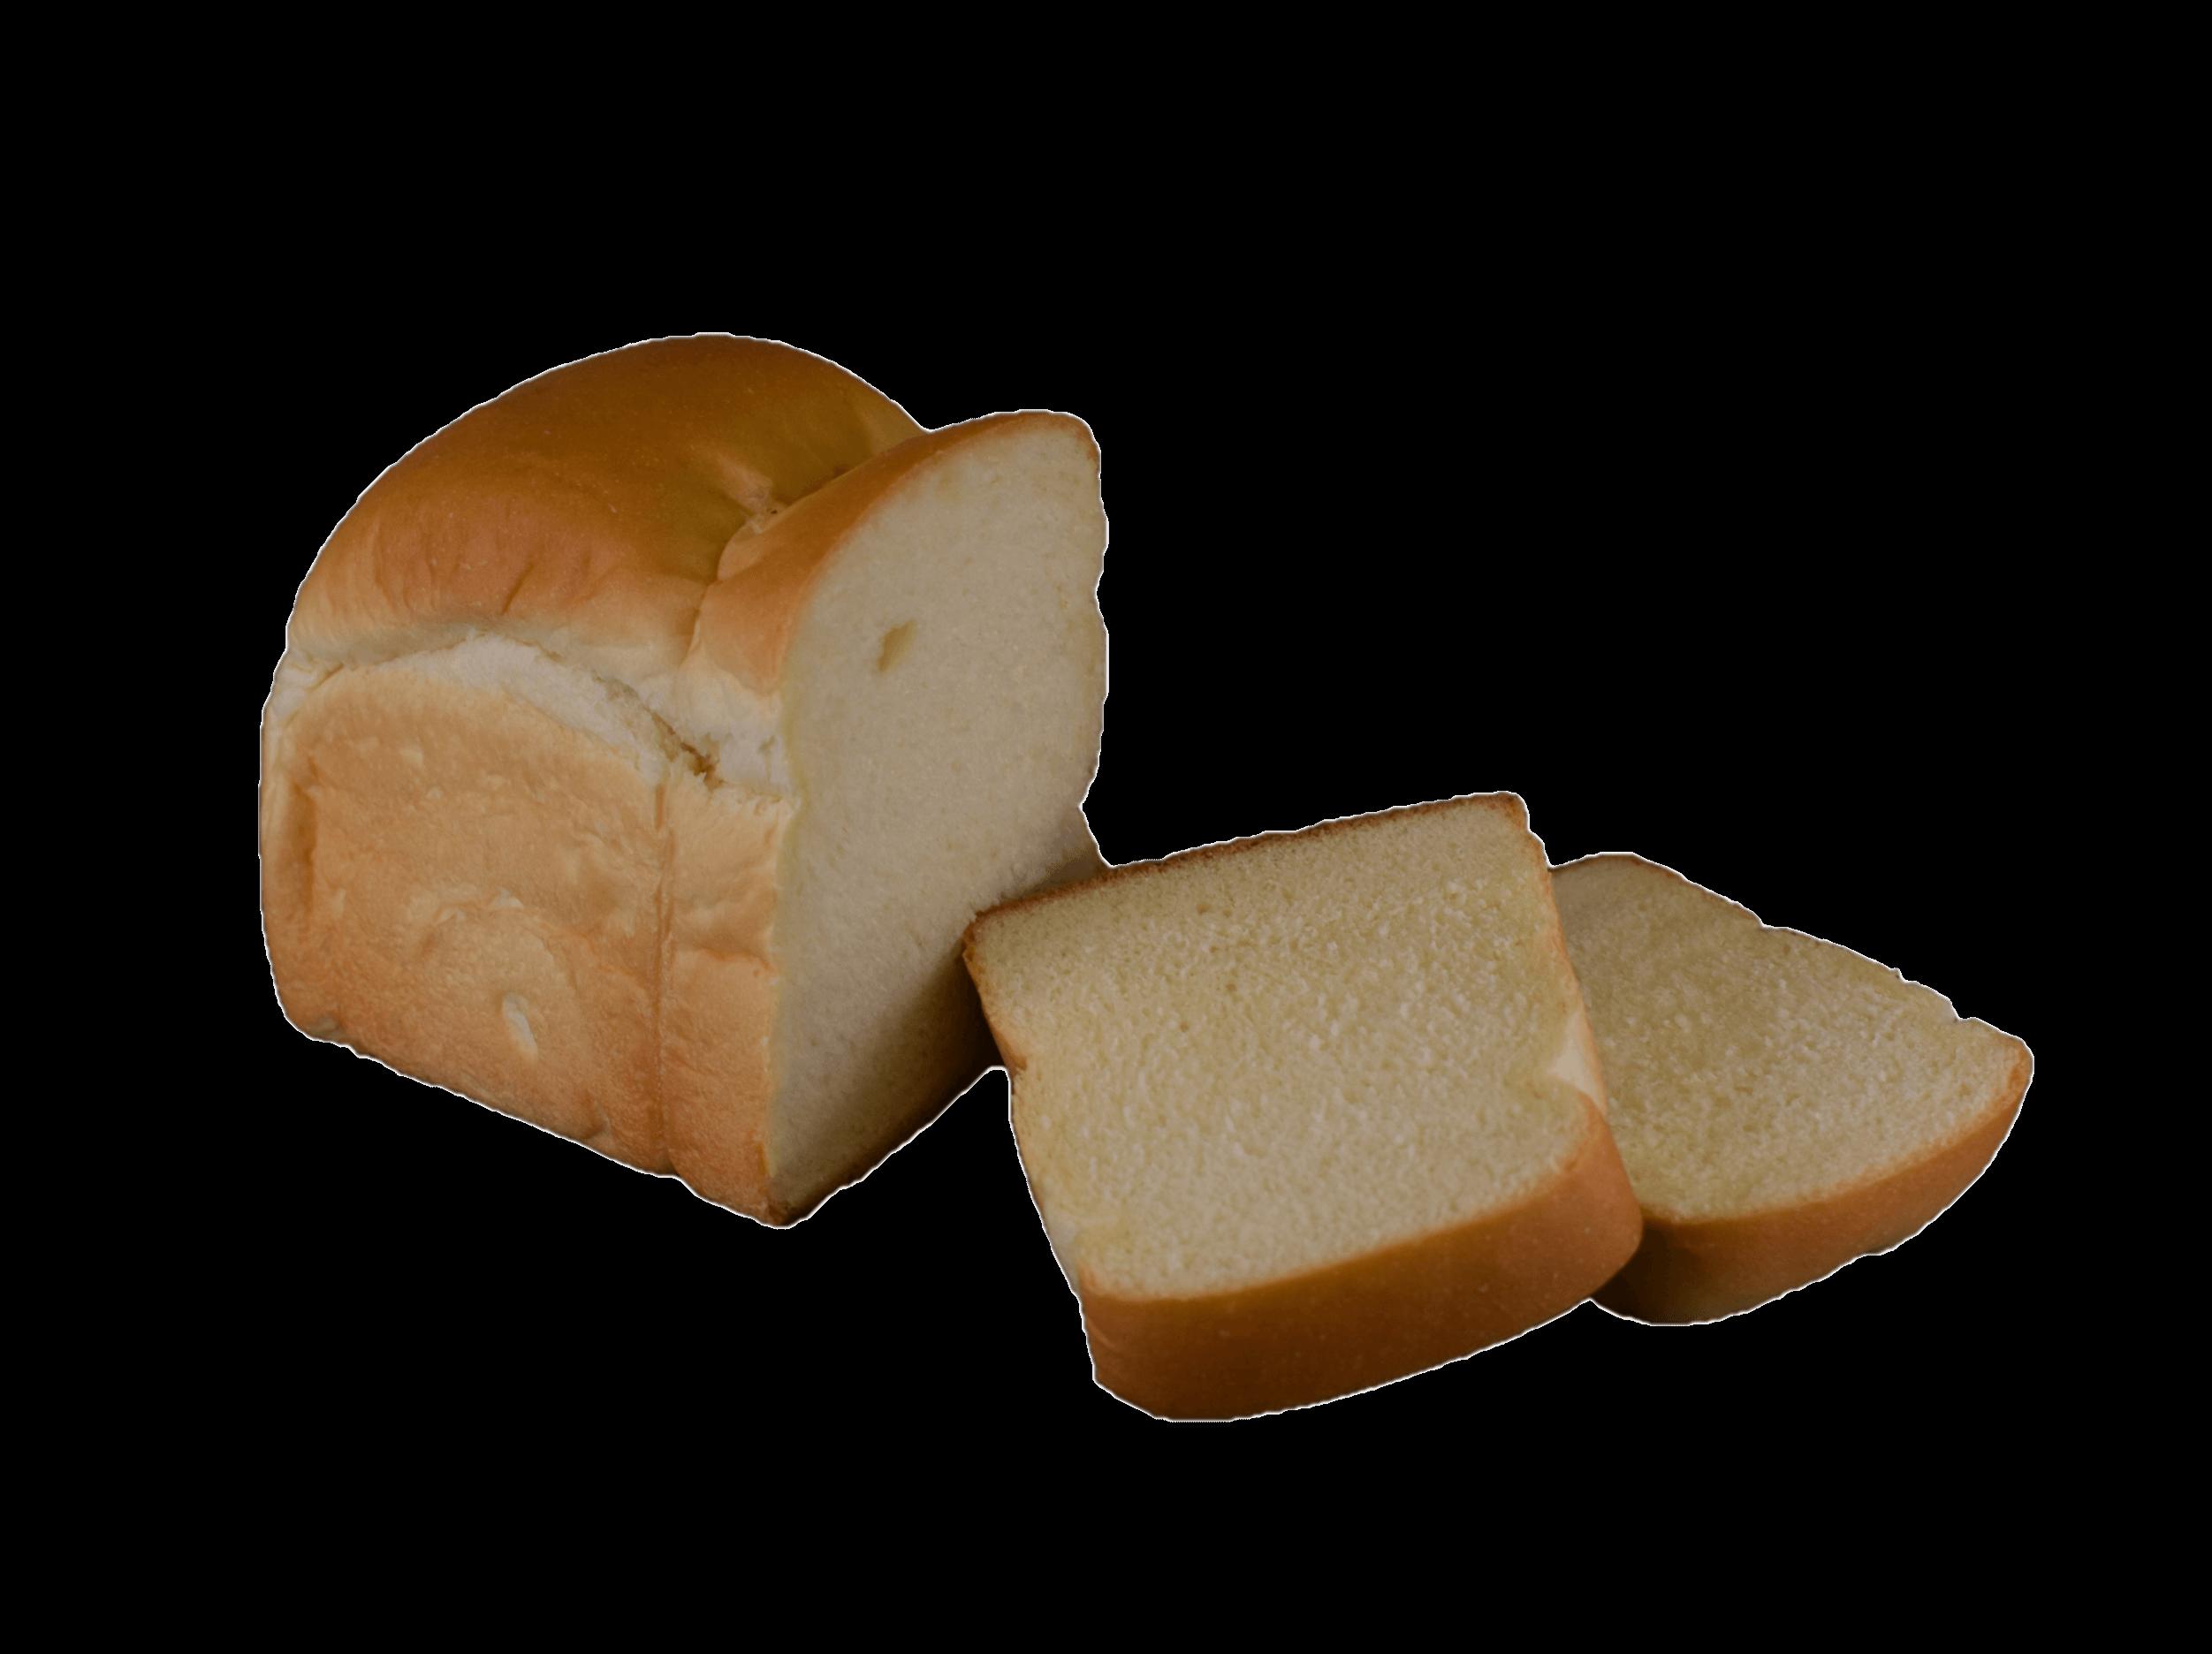 %e5%8c%97%e6%b5%b7%e9%81%93%e7%89%9b%e4%b9%b3%e9%a3%9f%e3%83%8f%e3%82%9a%e3%83%b3-hokkaido-milk-bread-2